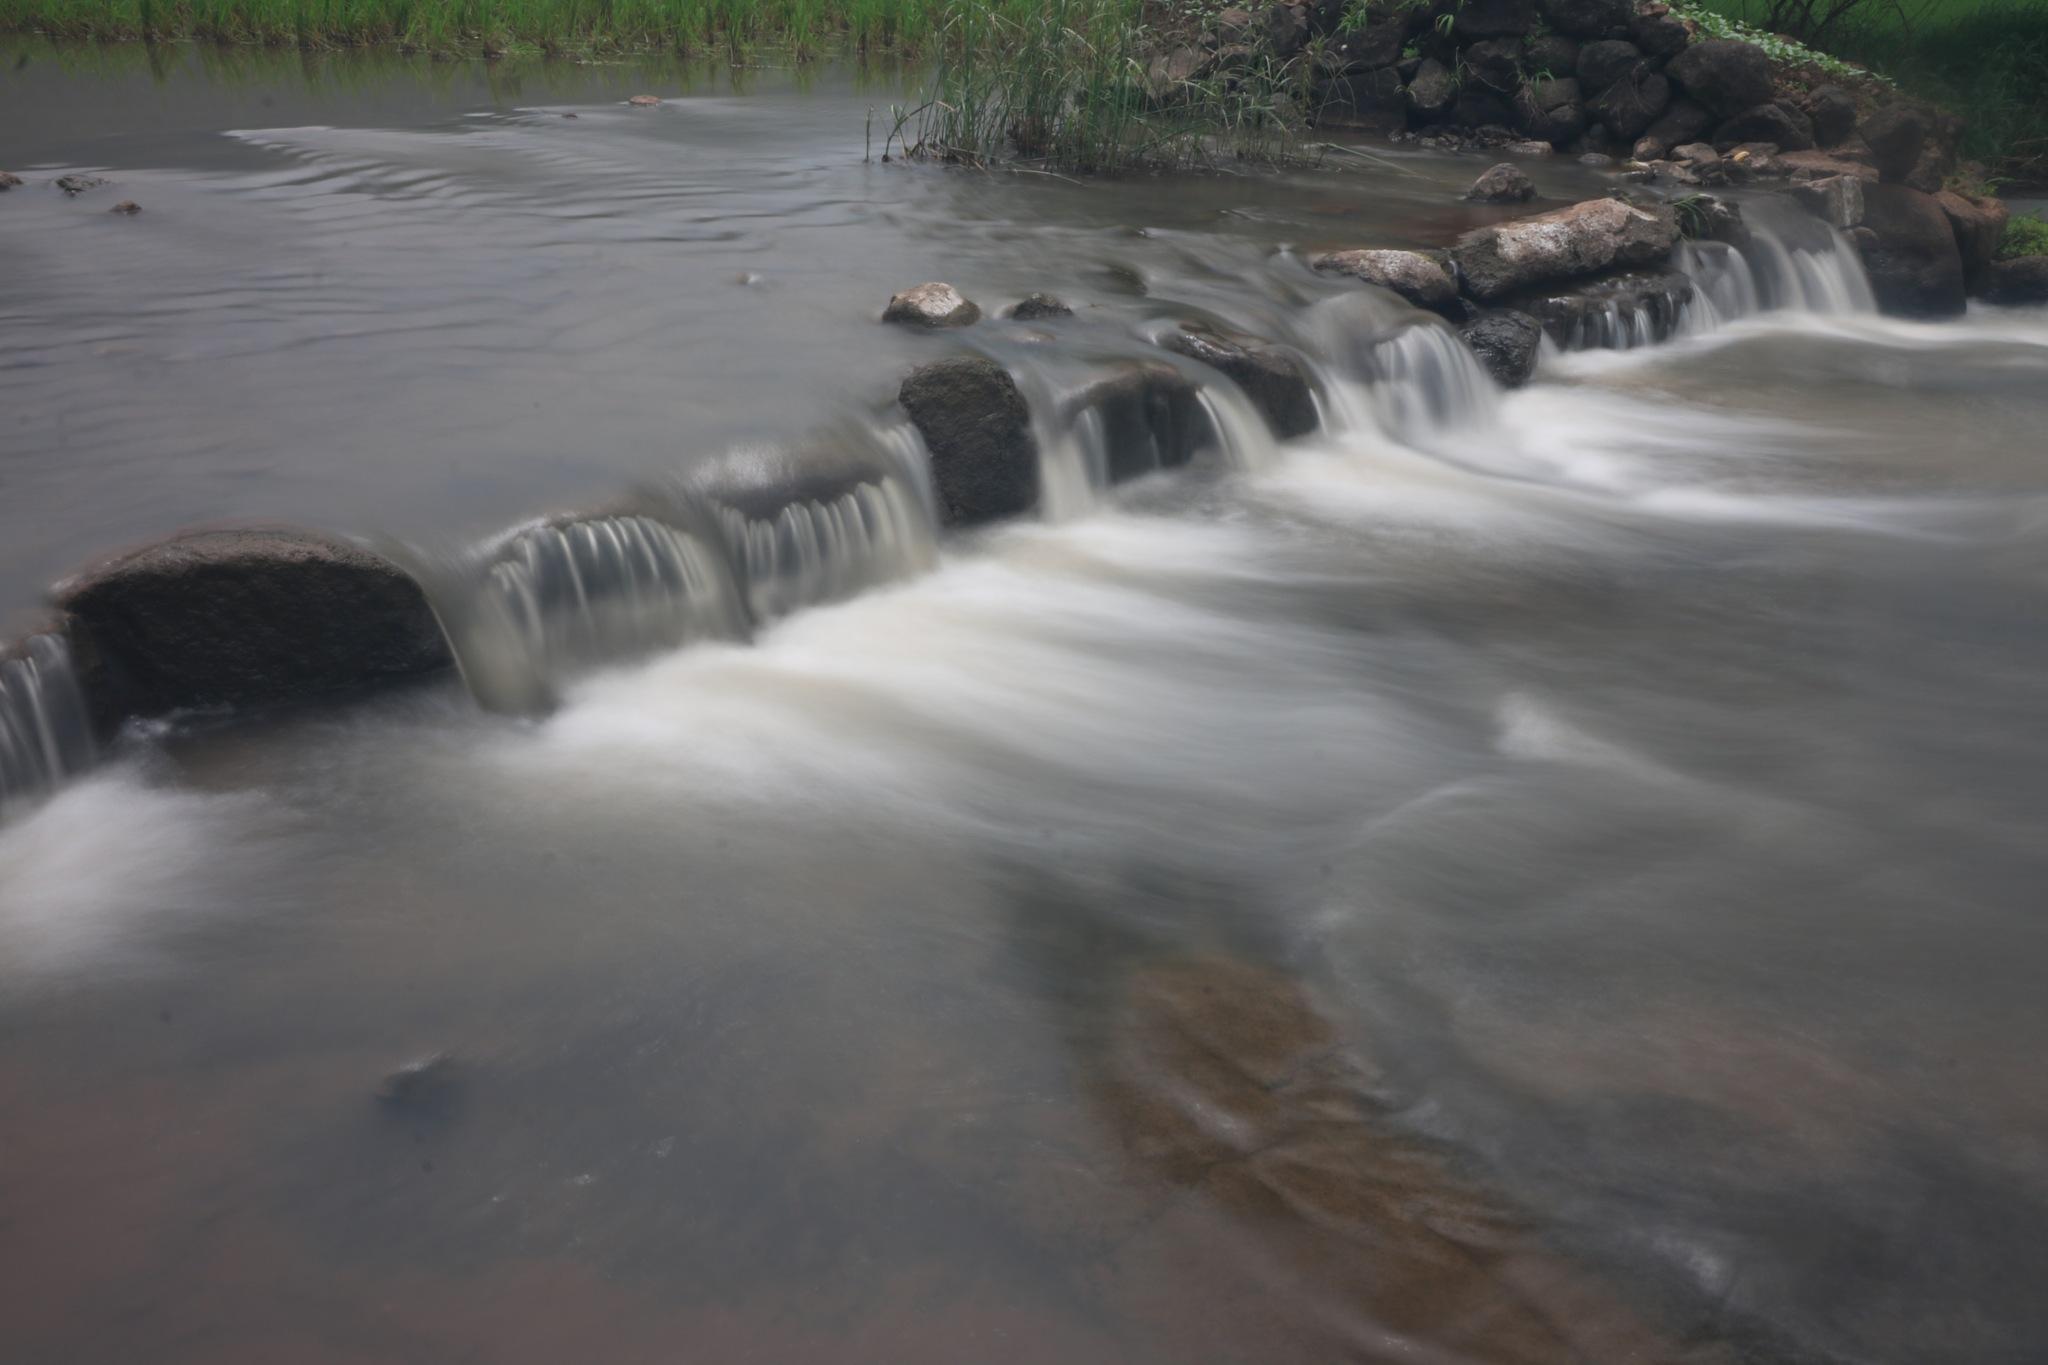 Soothing Falls by Surekha Pillai